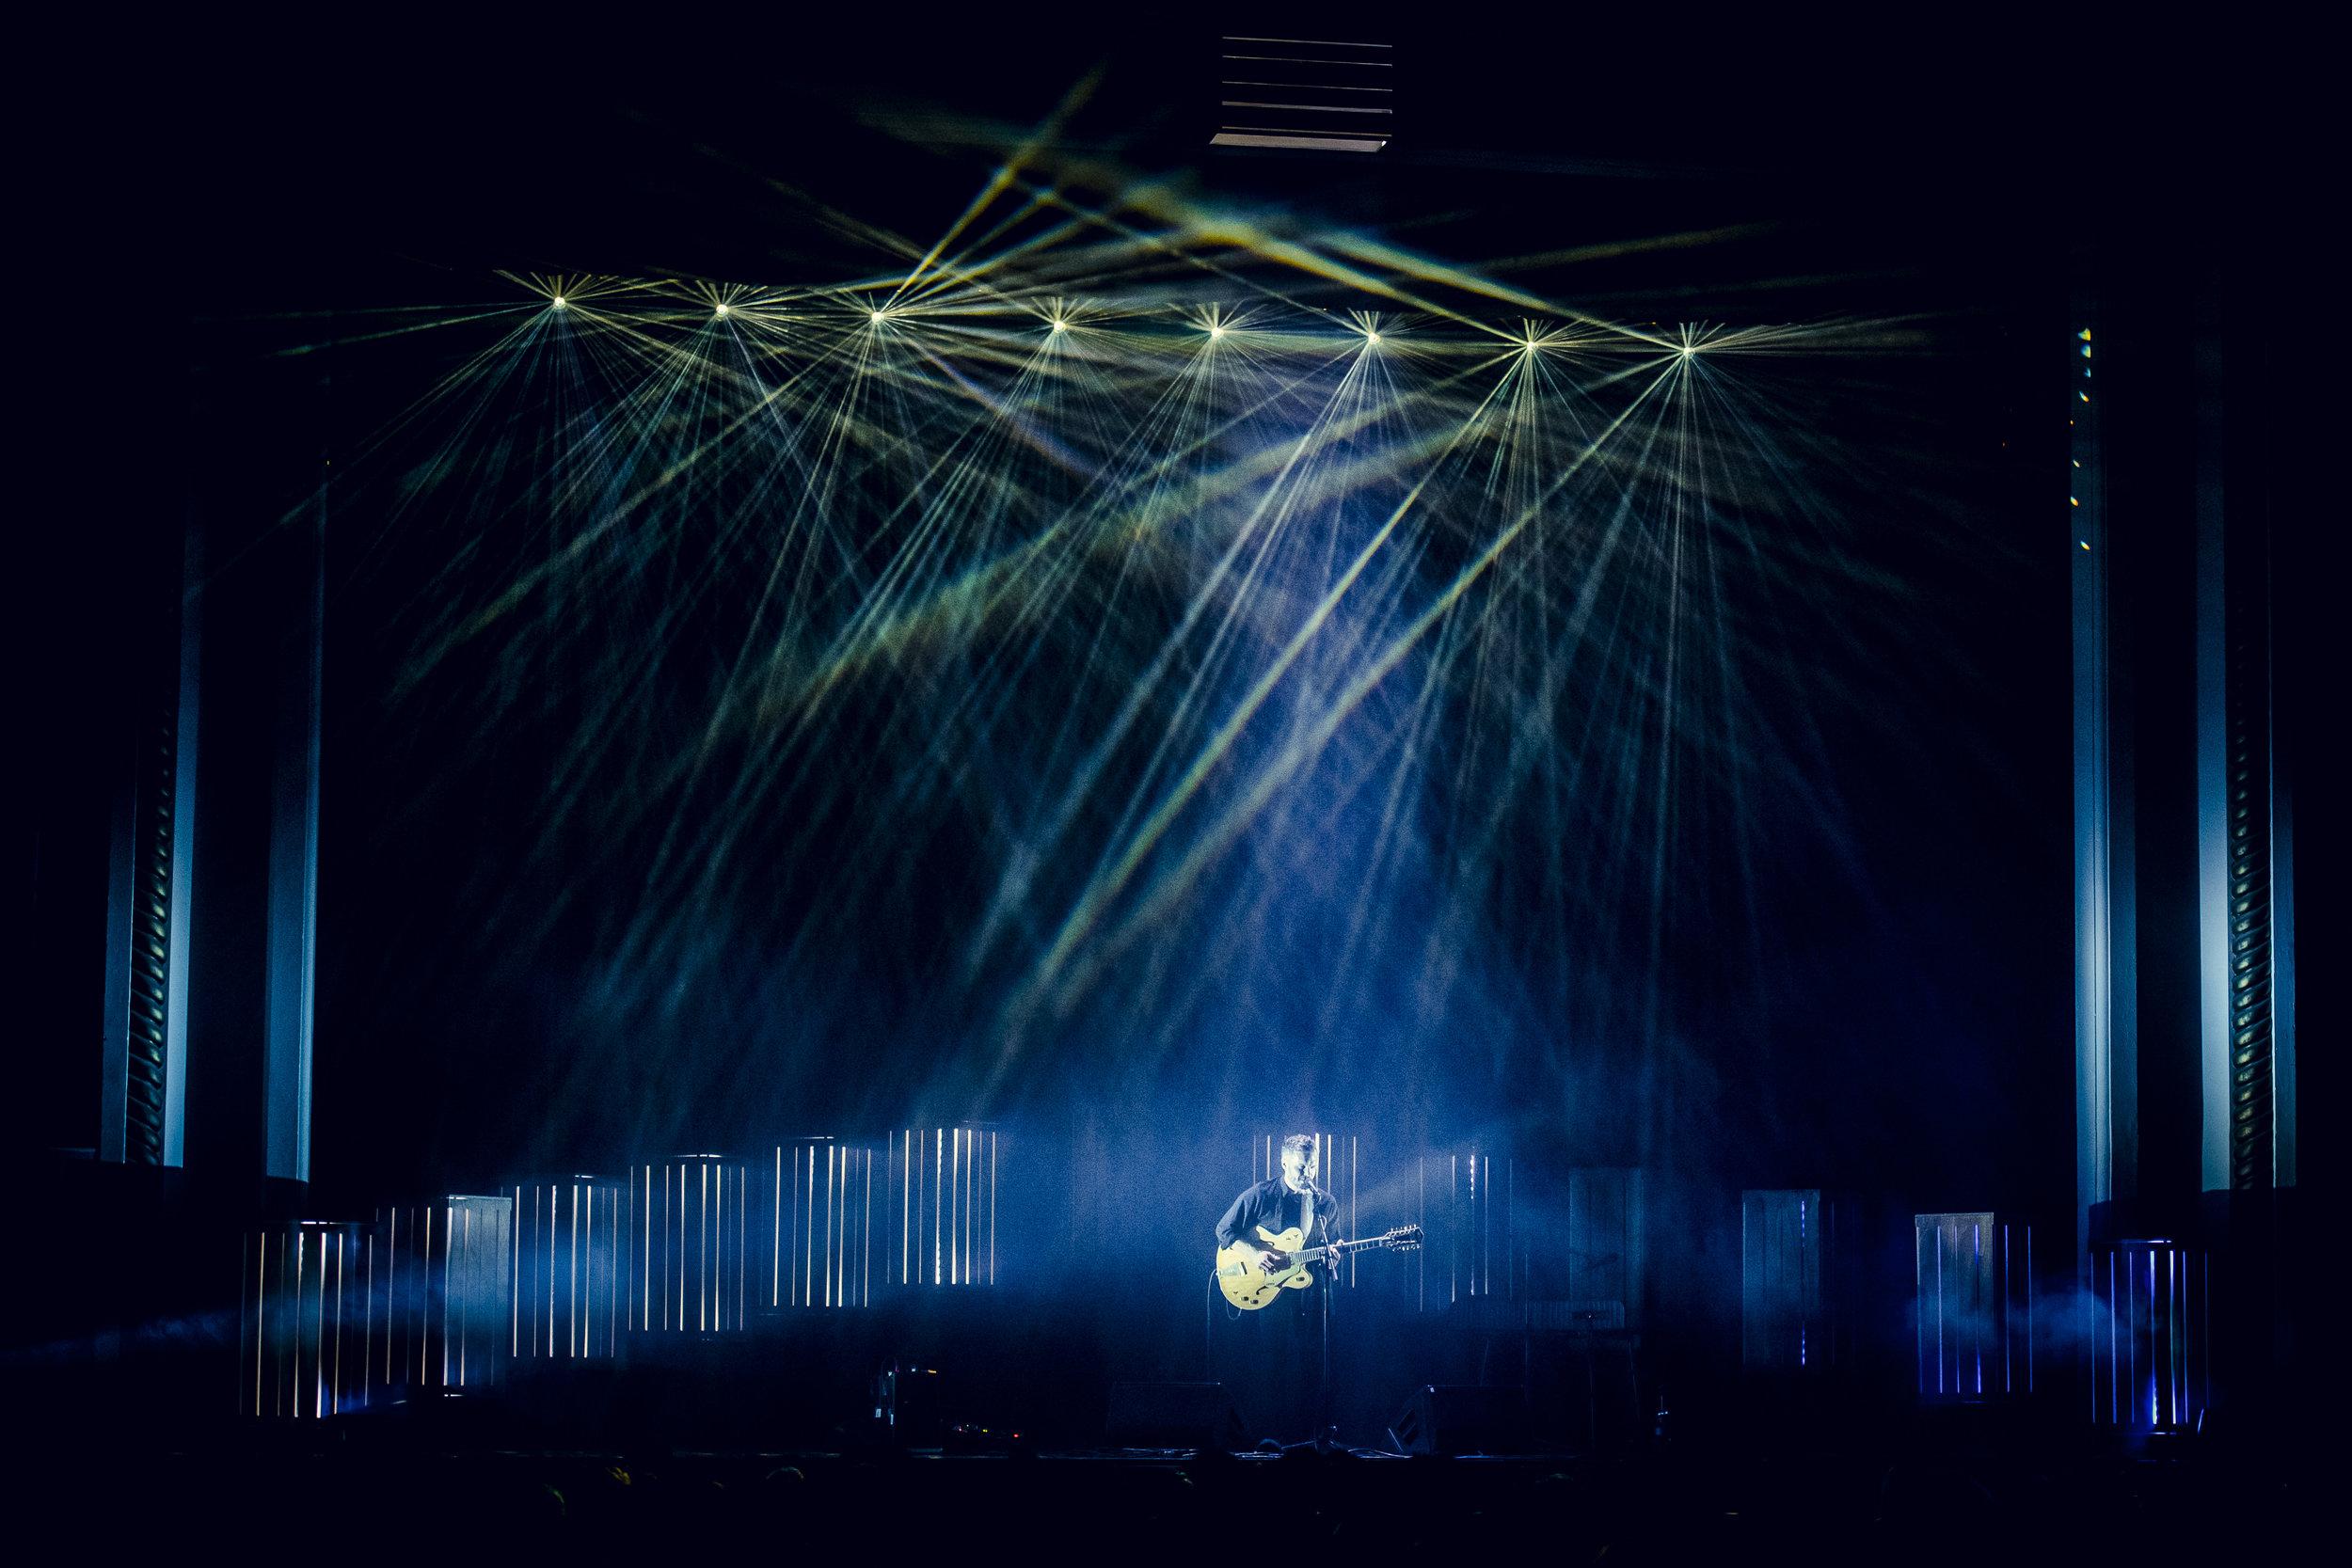 2018-09-27 - De Roma - The Tallest Man on Earth - 02 concert - 010.jpg